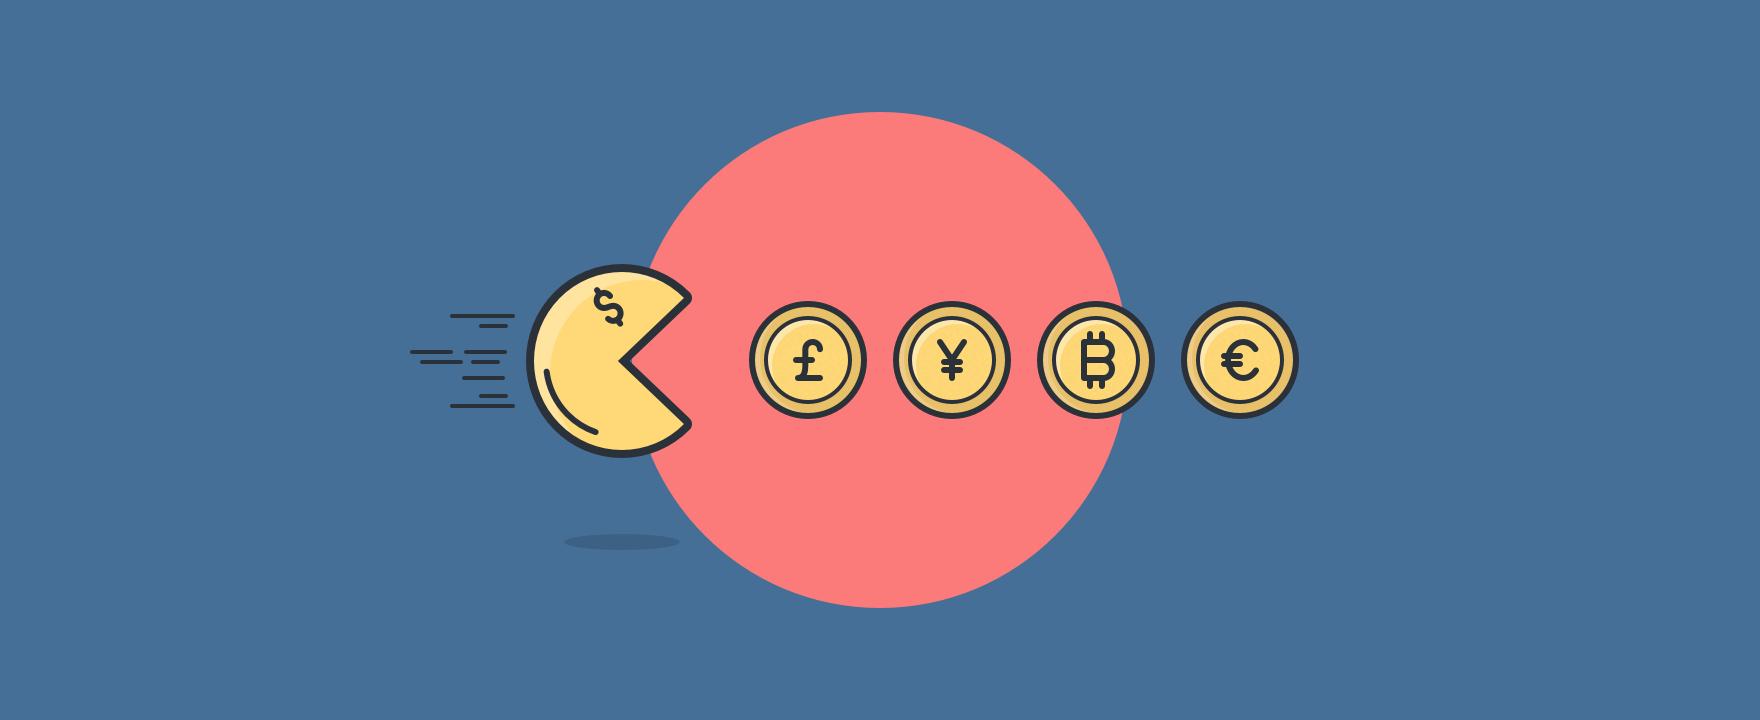 visualization of pacman - sales training games blog post header